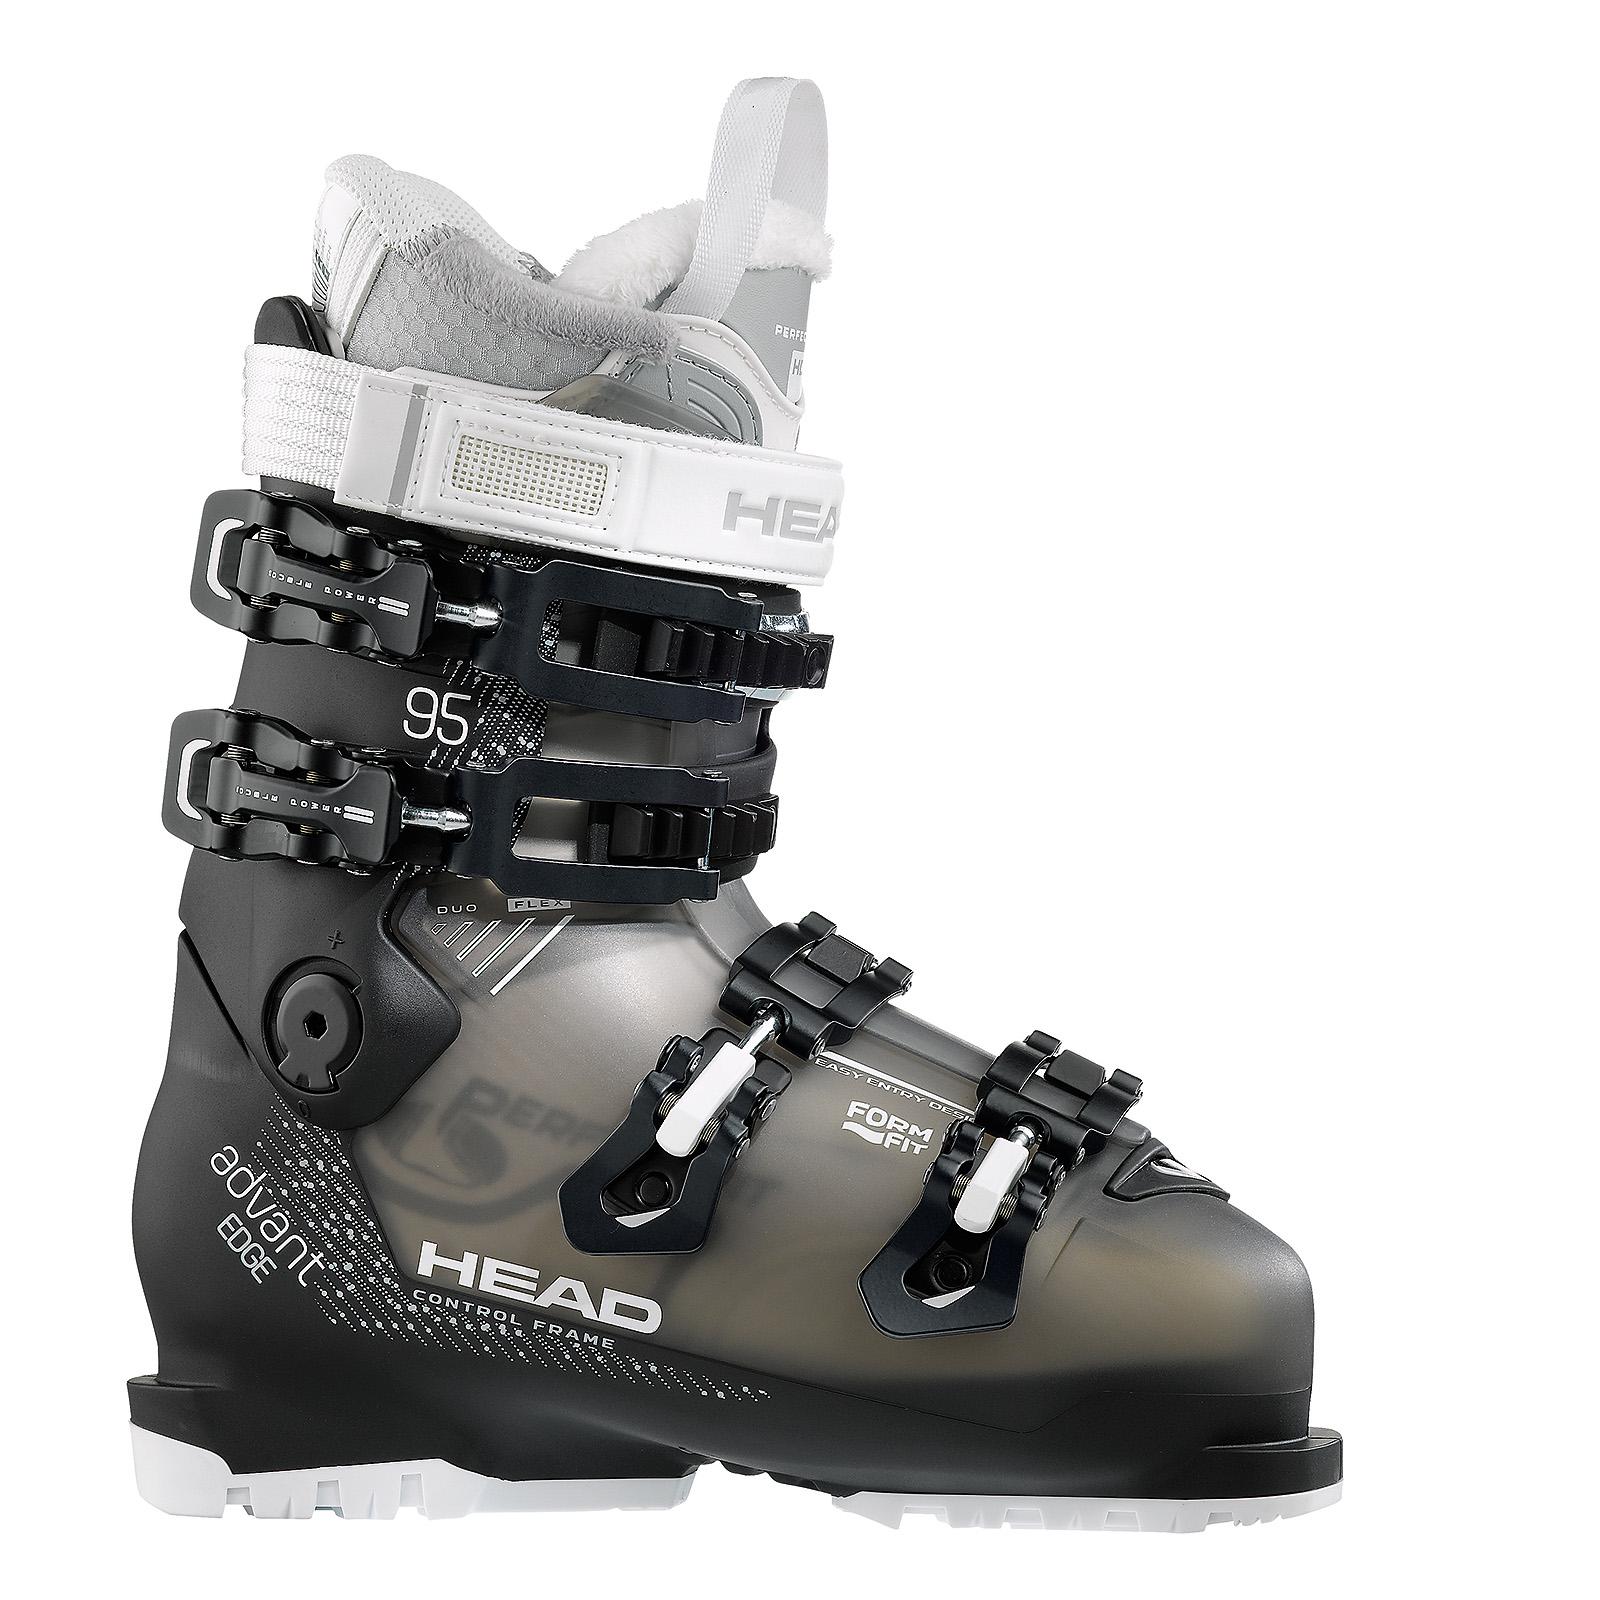 2017 18 Head Advant Edge 95 Womens Ski Boot Anything